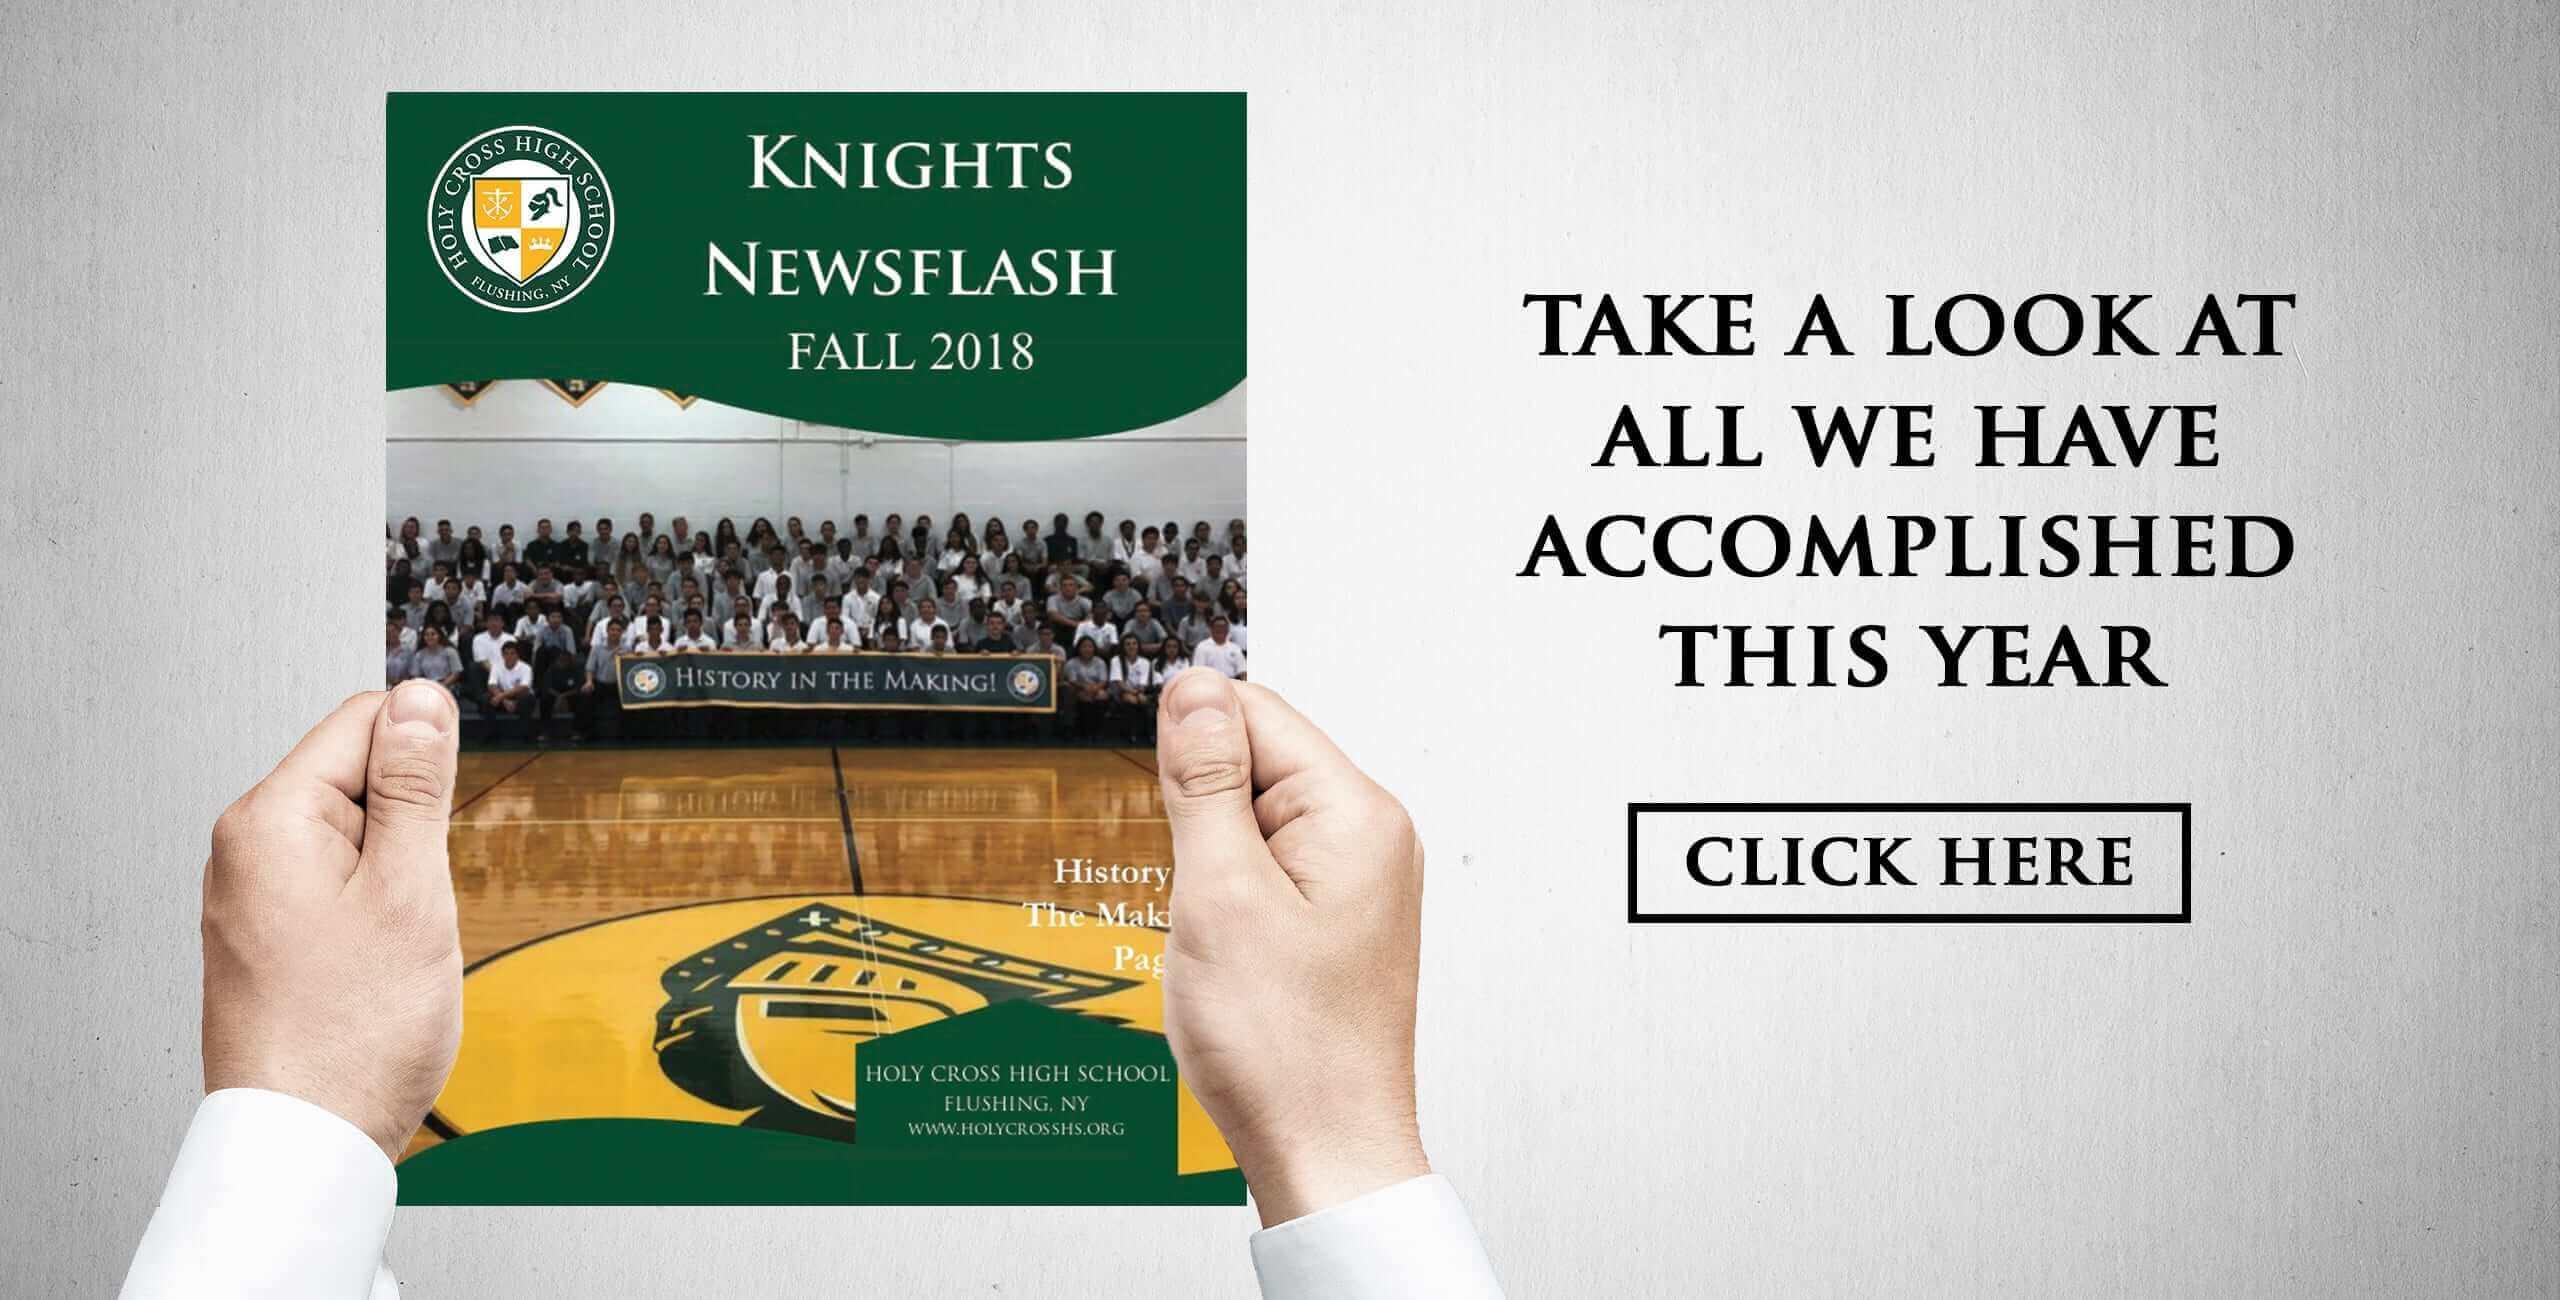 knightsnewsflash3.2